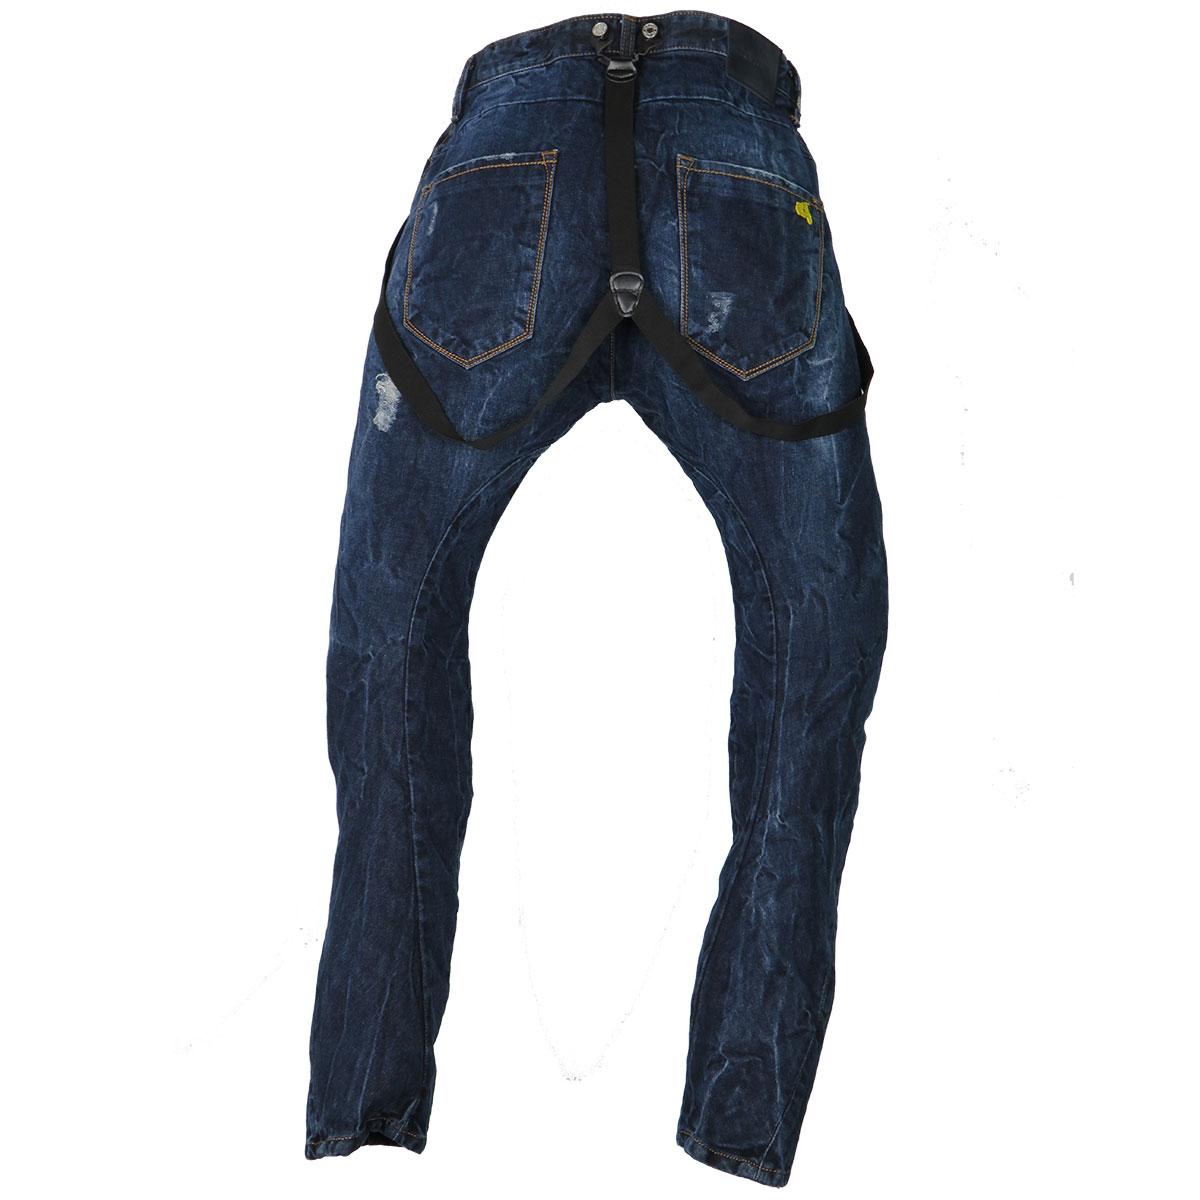 3adb95588d1 New Denim 1212 Ανδρικό Παντελόνι Μπλε - Privato